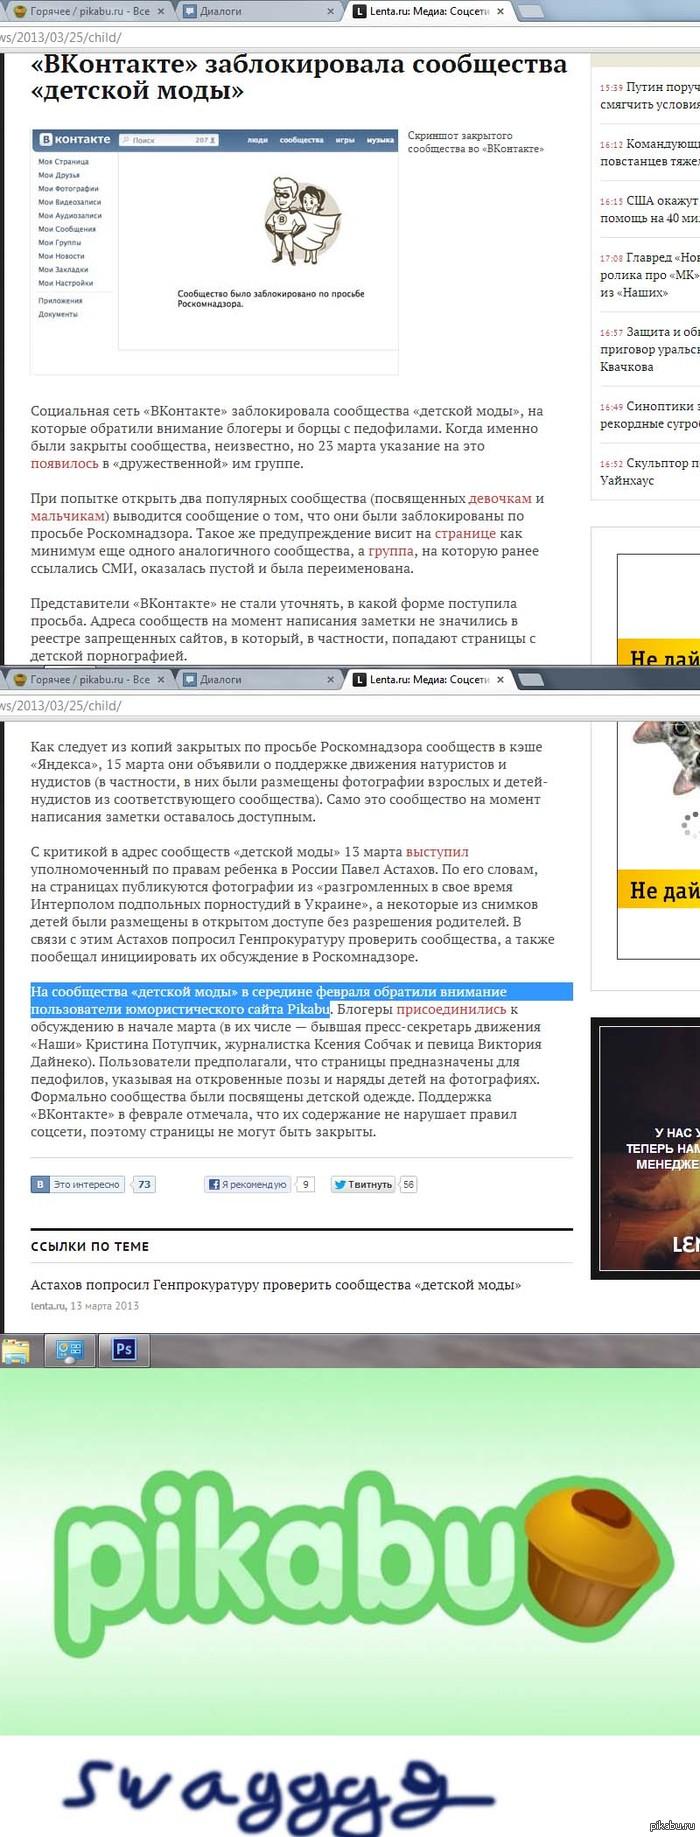 http://s.pikabu.ru/post_img/2013/03/25/9/1364217909_777459726.jpg